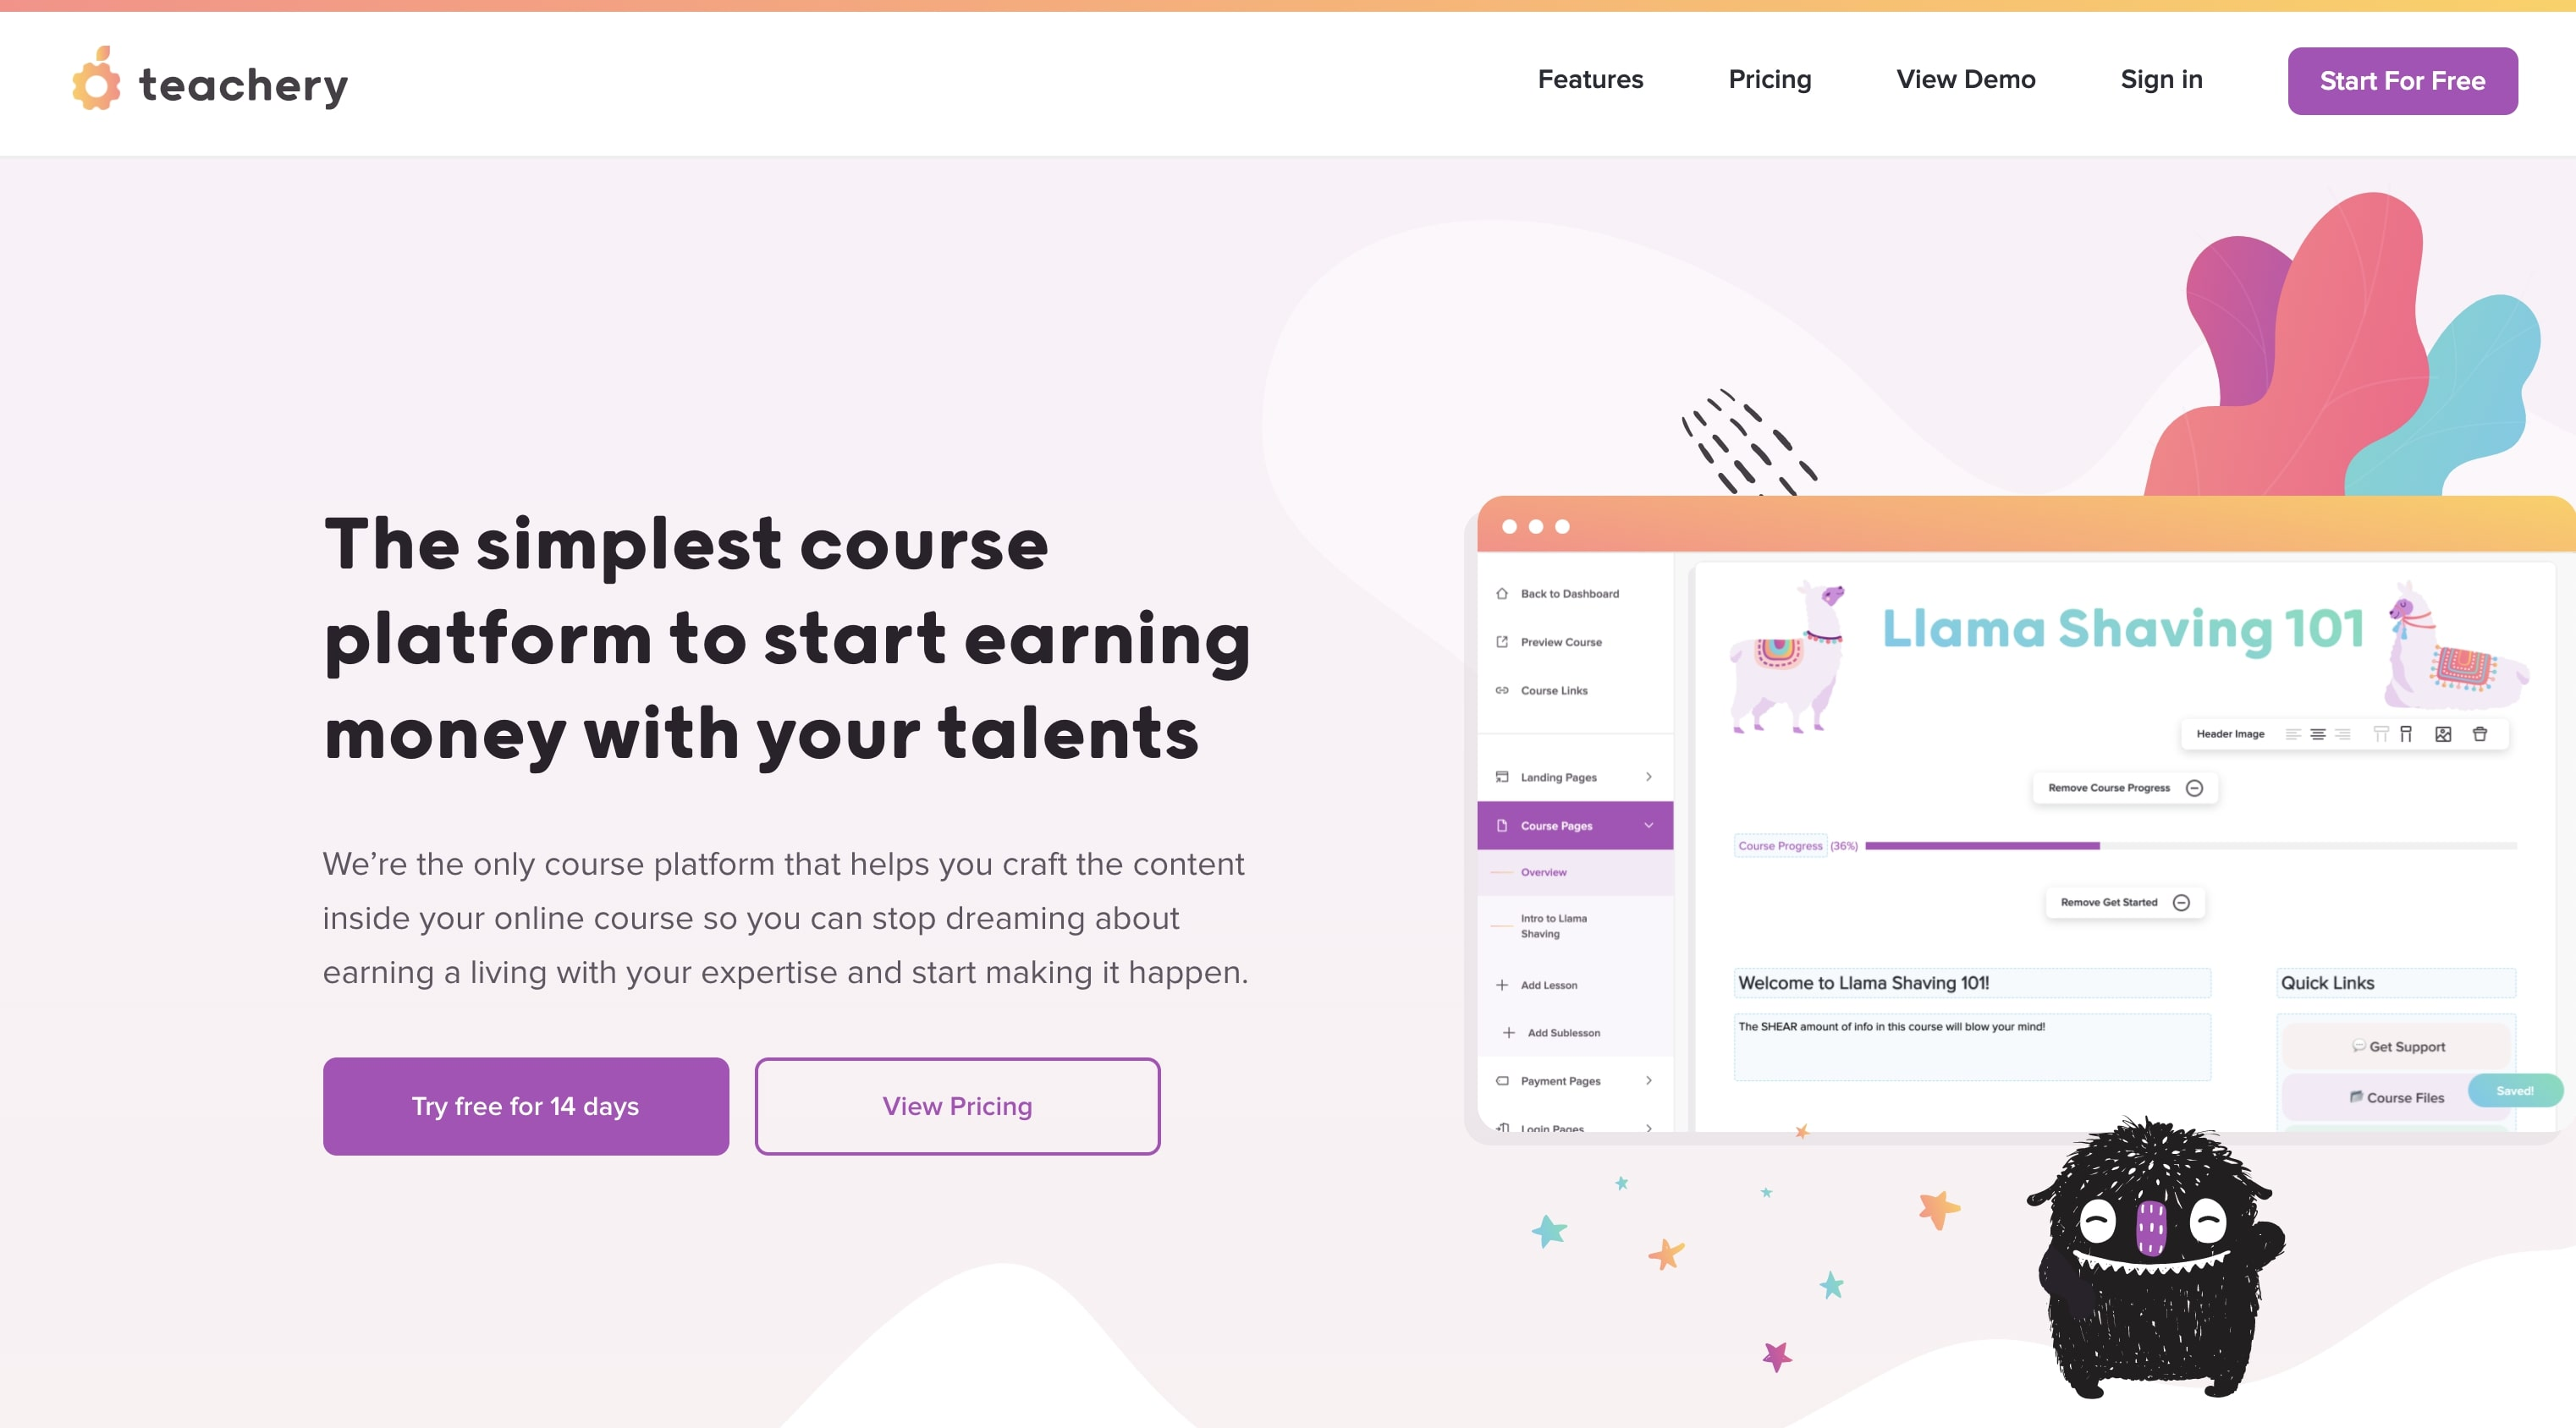 An image of the Teachery website.